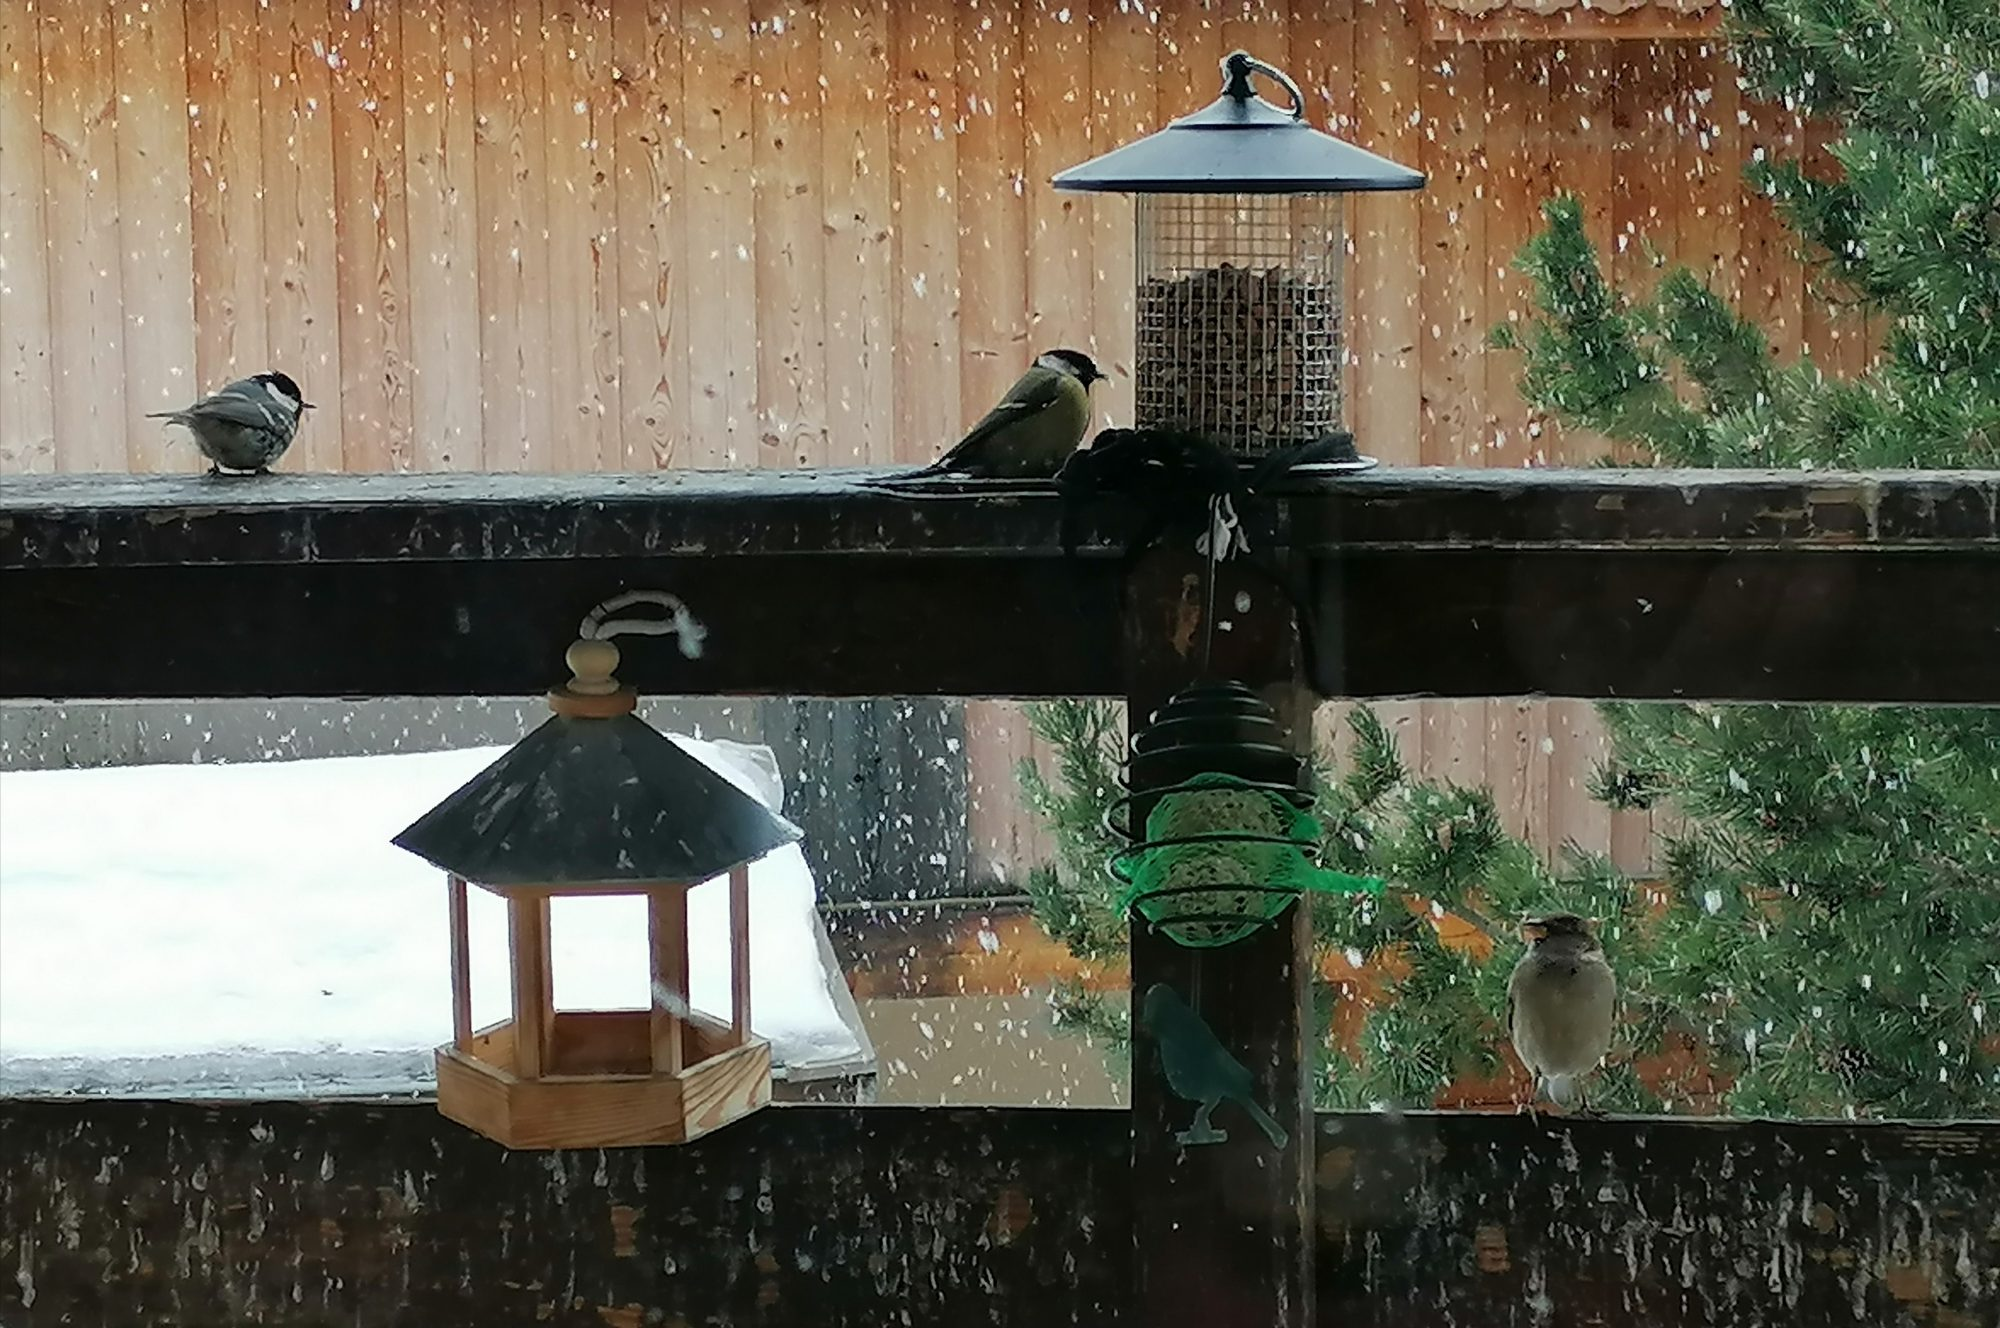 Birds aplenty on the balcony daily